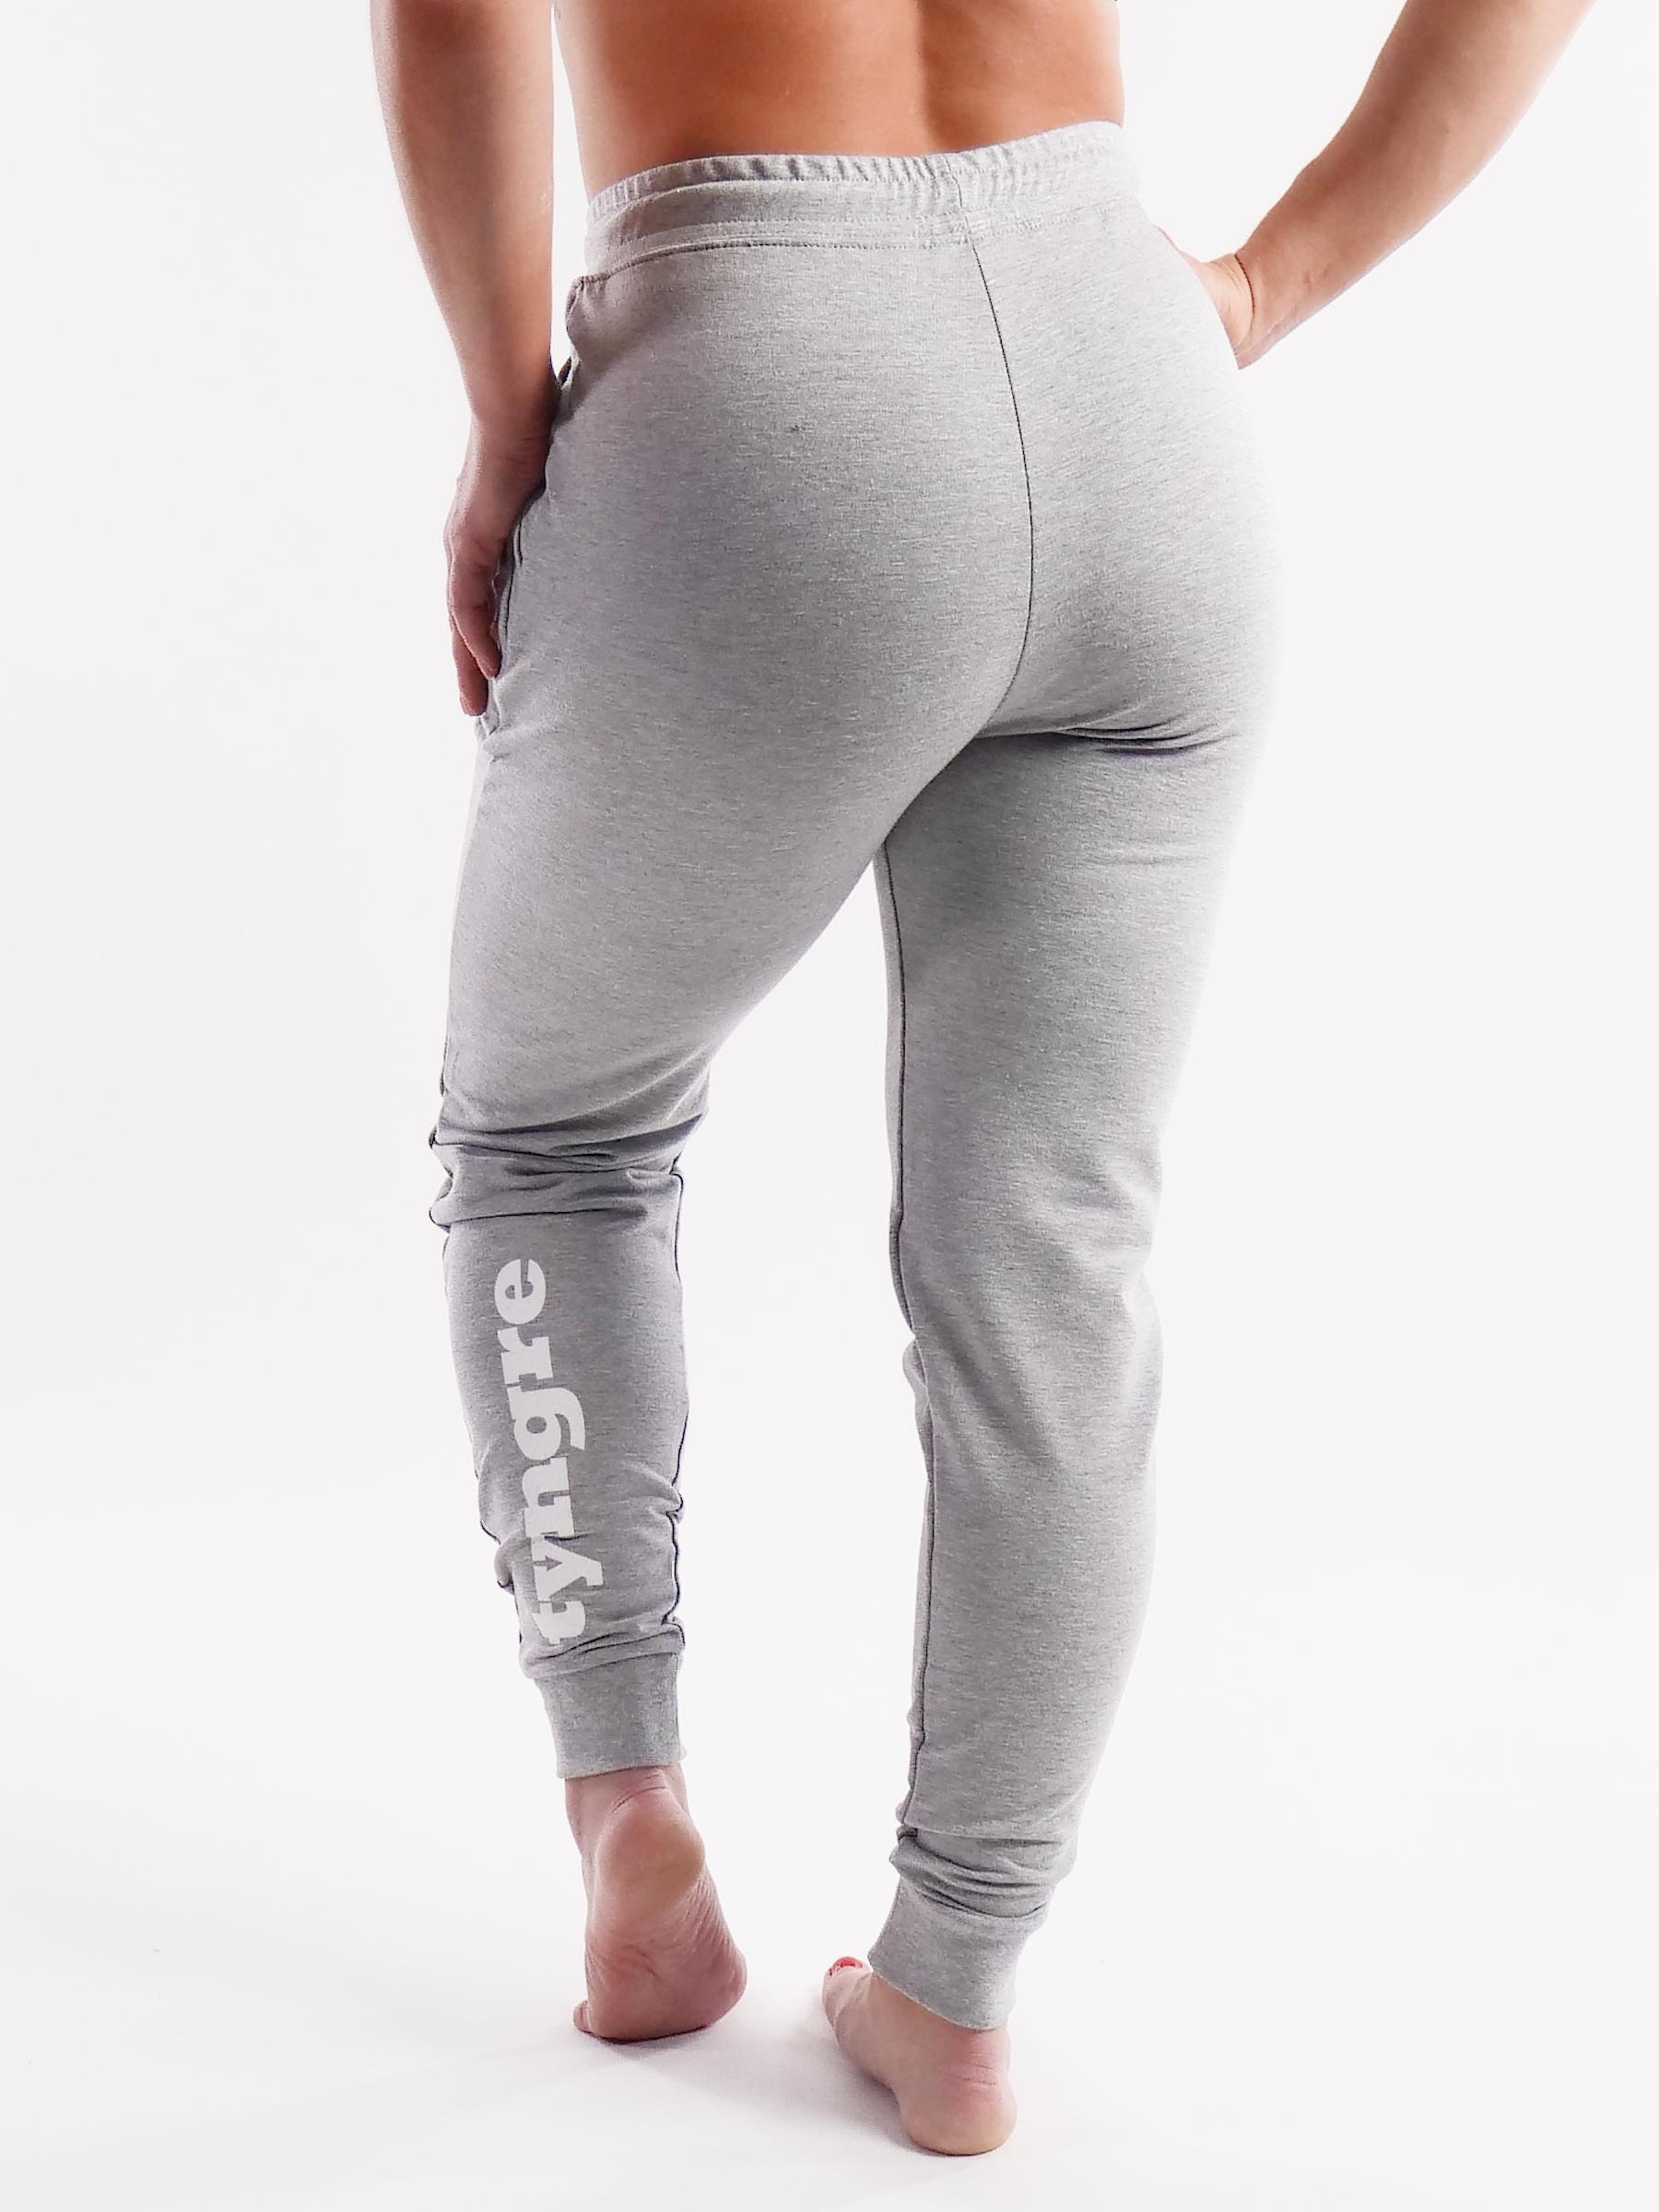 Sweatpants Work Womens Light Gray